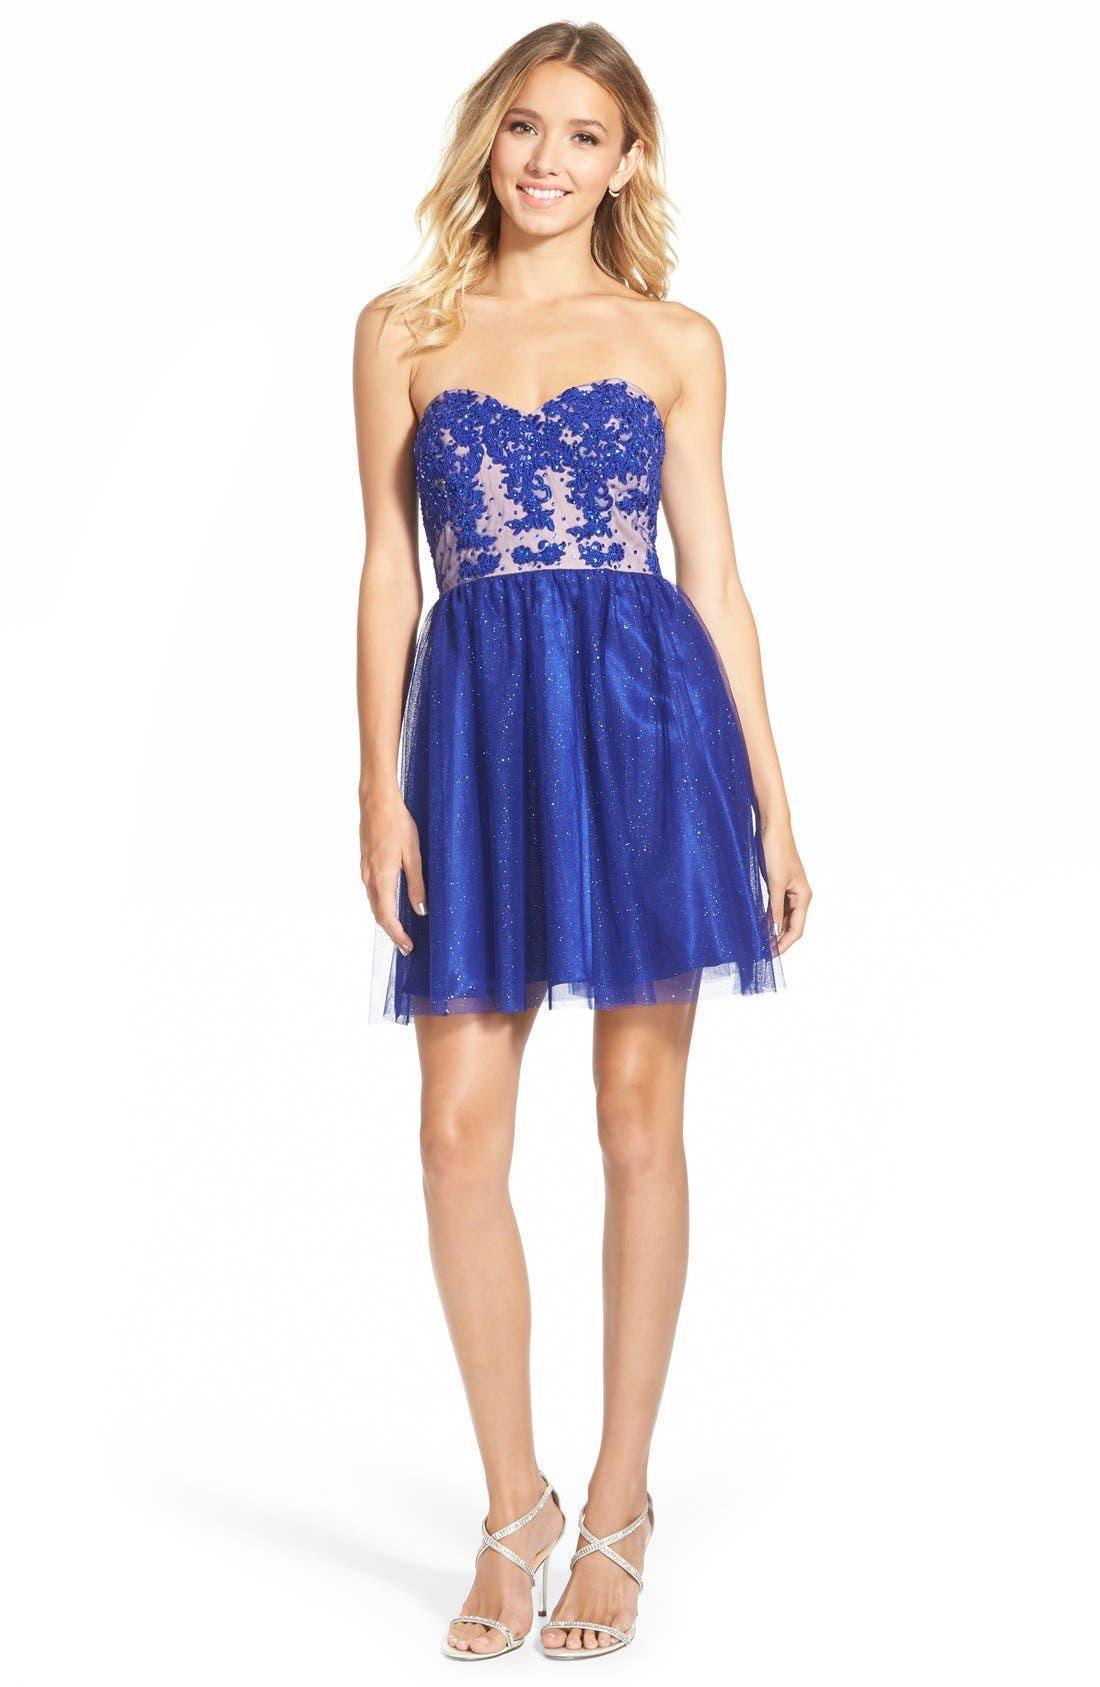 Main Image - Jump Apparel Strapless Lace Bodice Skater Dress